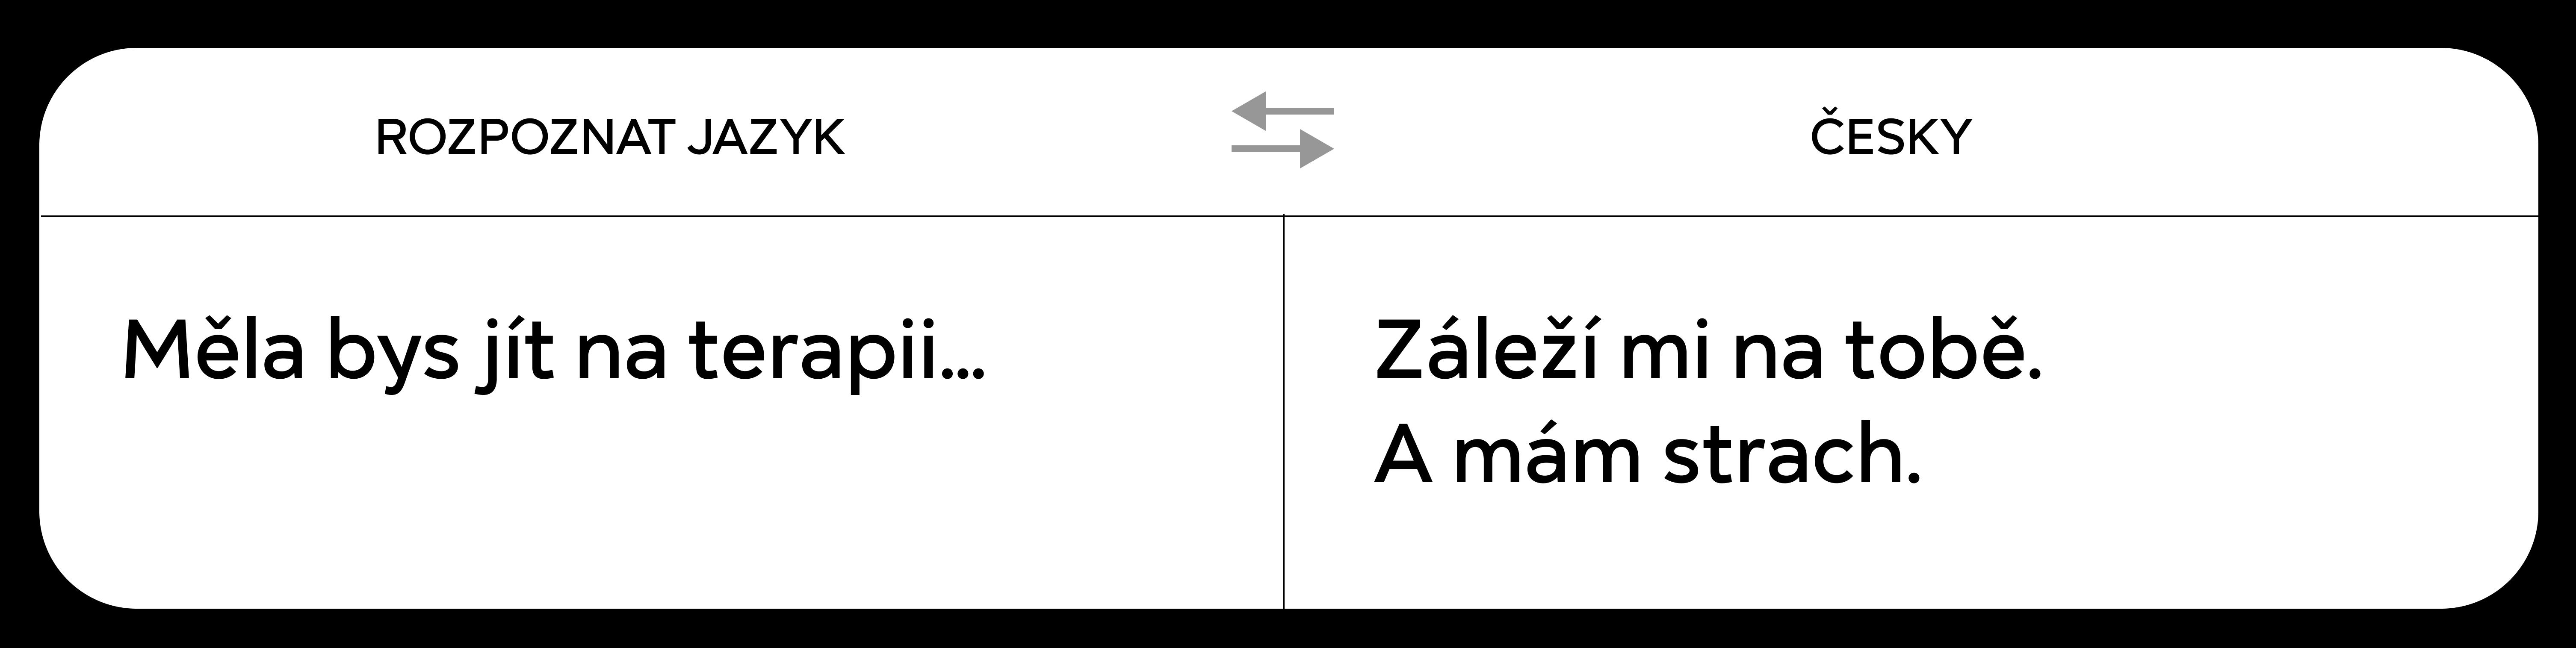 prekladac (1)-png.png